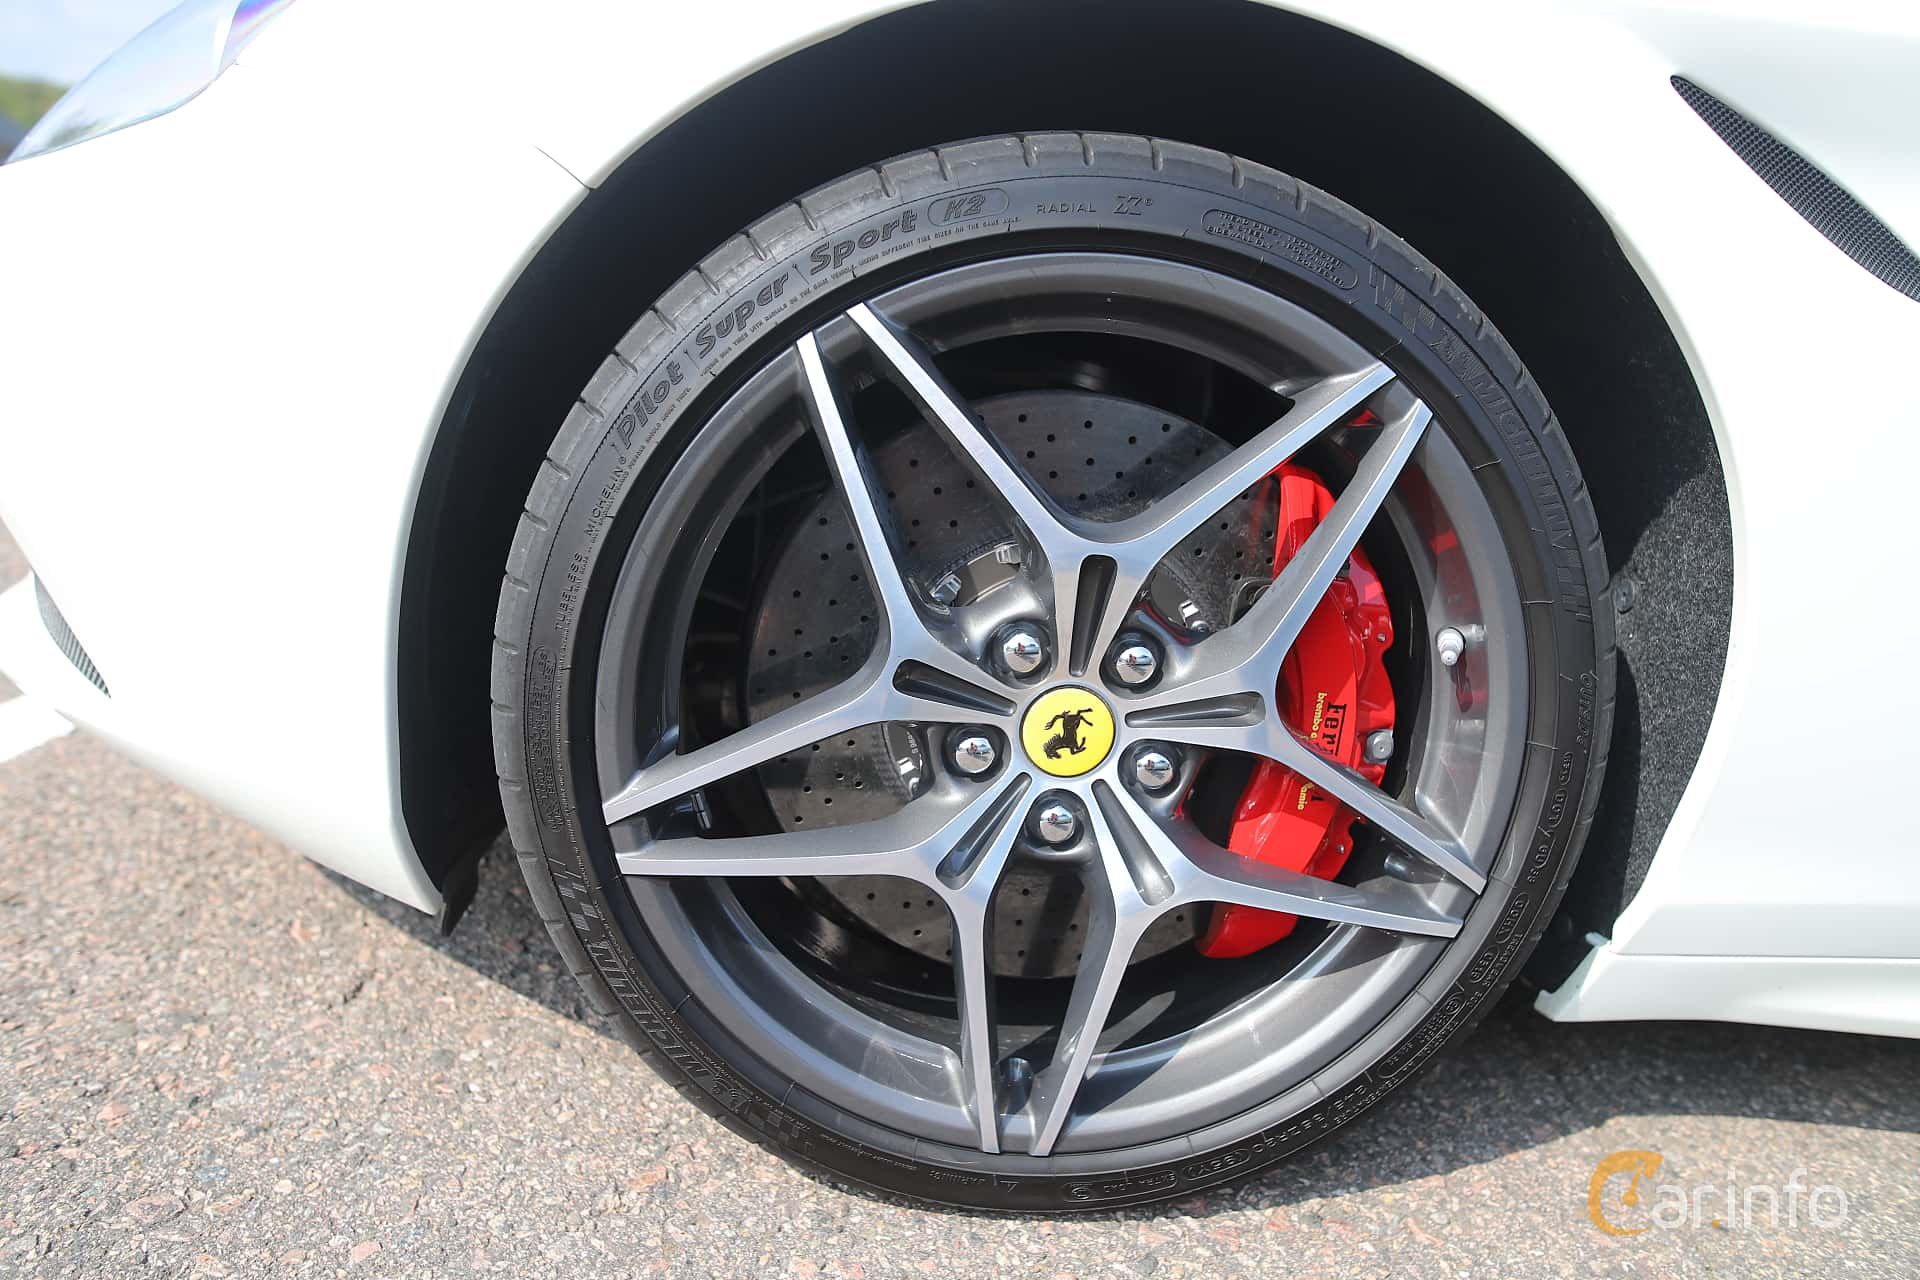 Ferrari California T 3.9 V8  DCT, 560hp, 2015 at Autoropa Racing day Knutstorp 2019